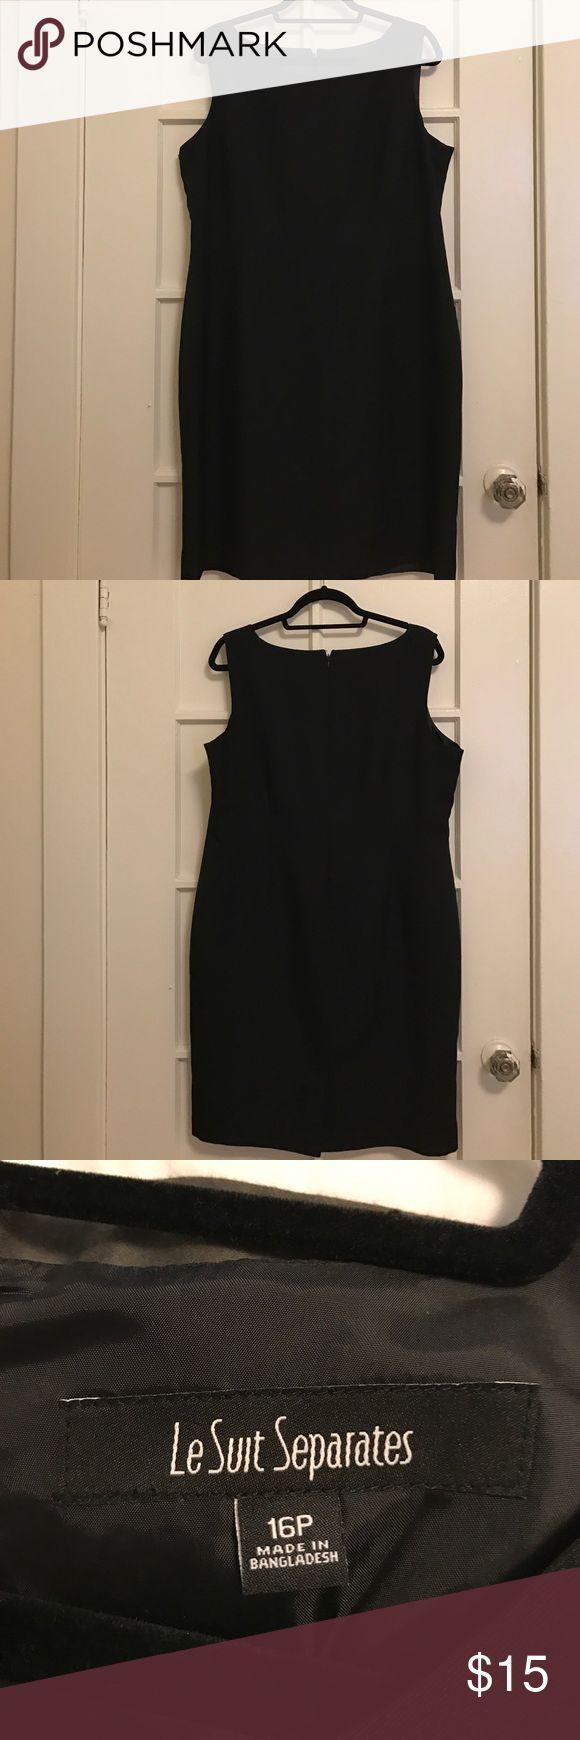 Black Shift Dress - Le Suit Separates Black Shift Dress good for work or formal wear. Le Suit Dresses